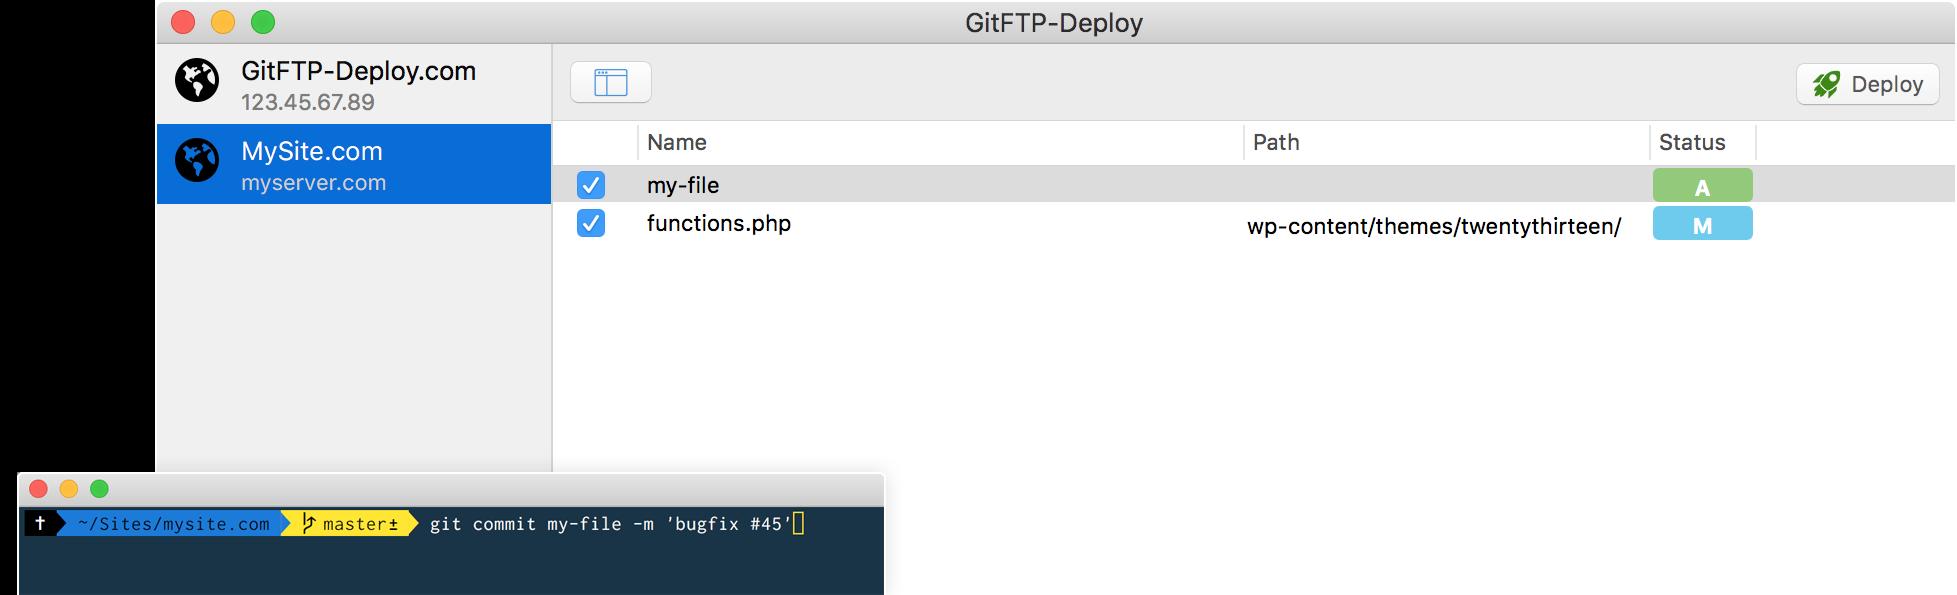 GitFTP-Deploy 2.7.1 Mac 破解版 优秀的FTP 上传部署工具-麦氪派